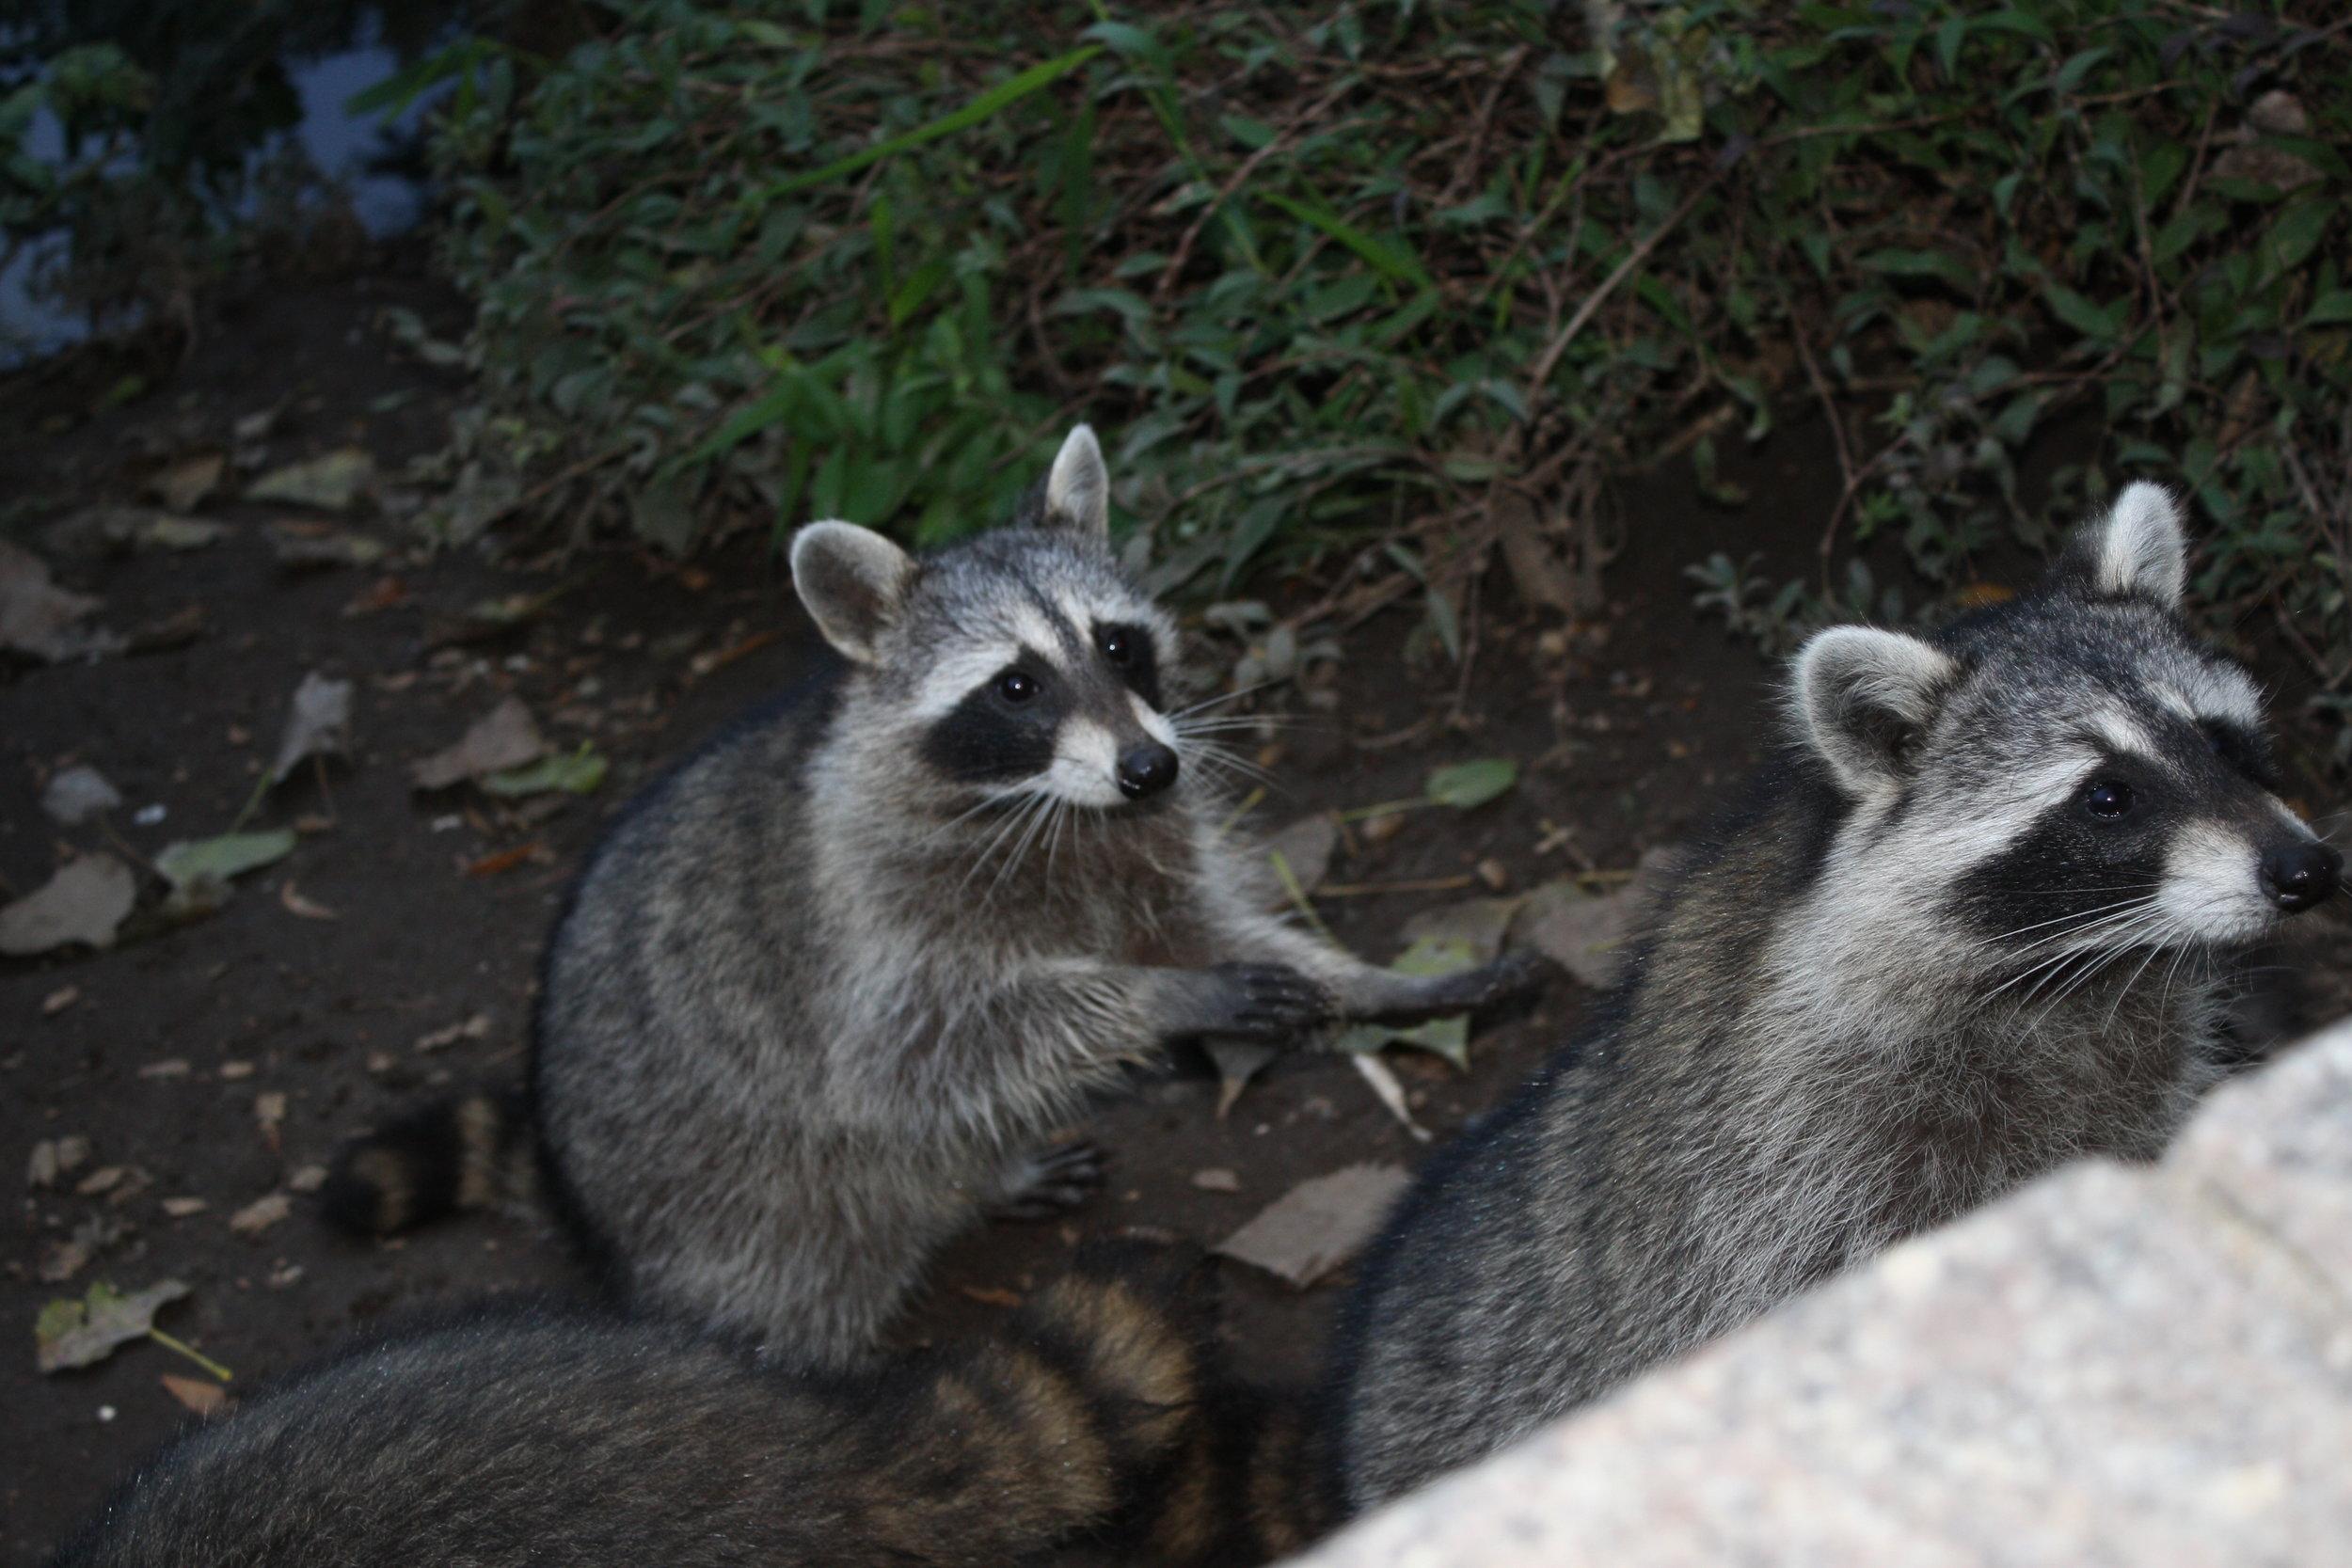 Central Park Raccoons